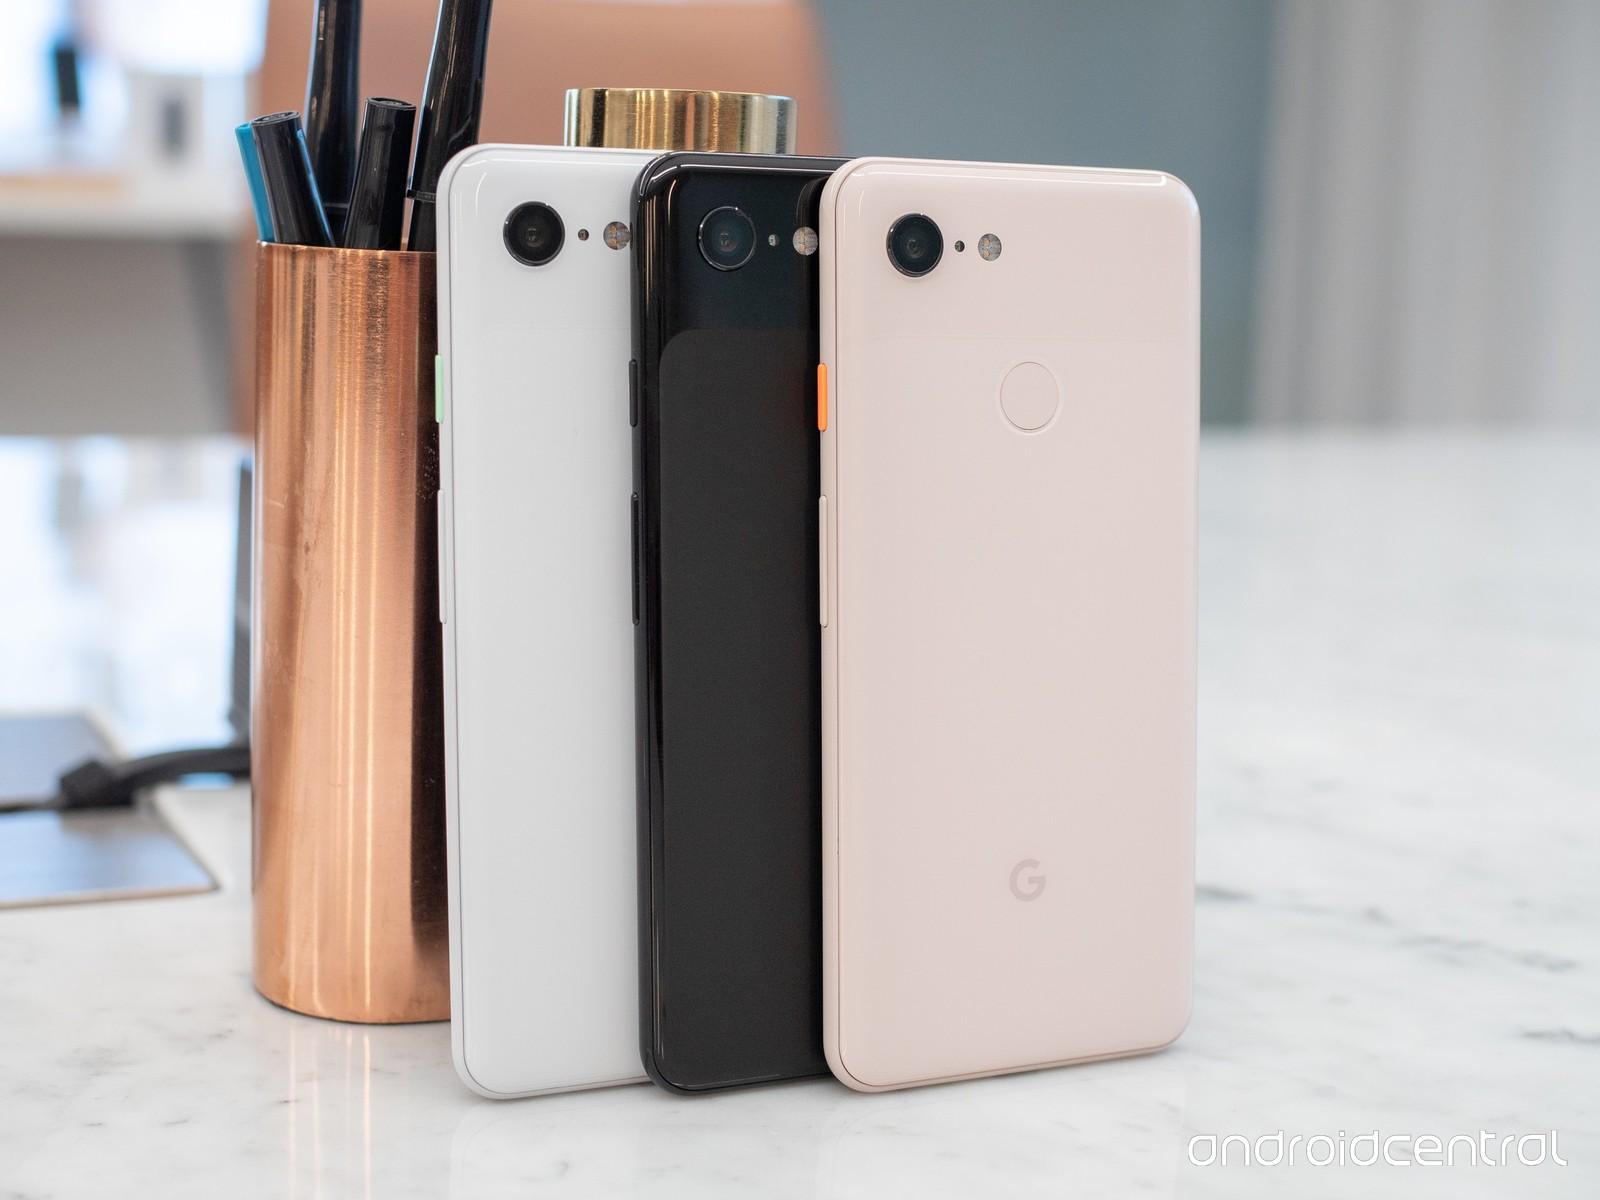 google-announcements-pixel-3-and-pixel-3-xl all colors